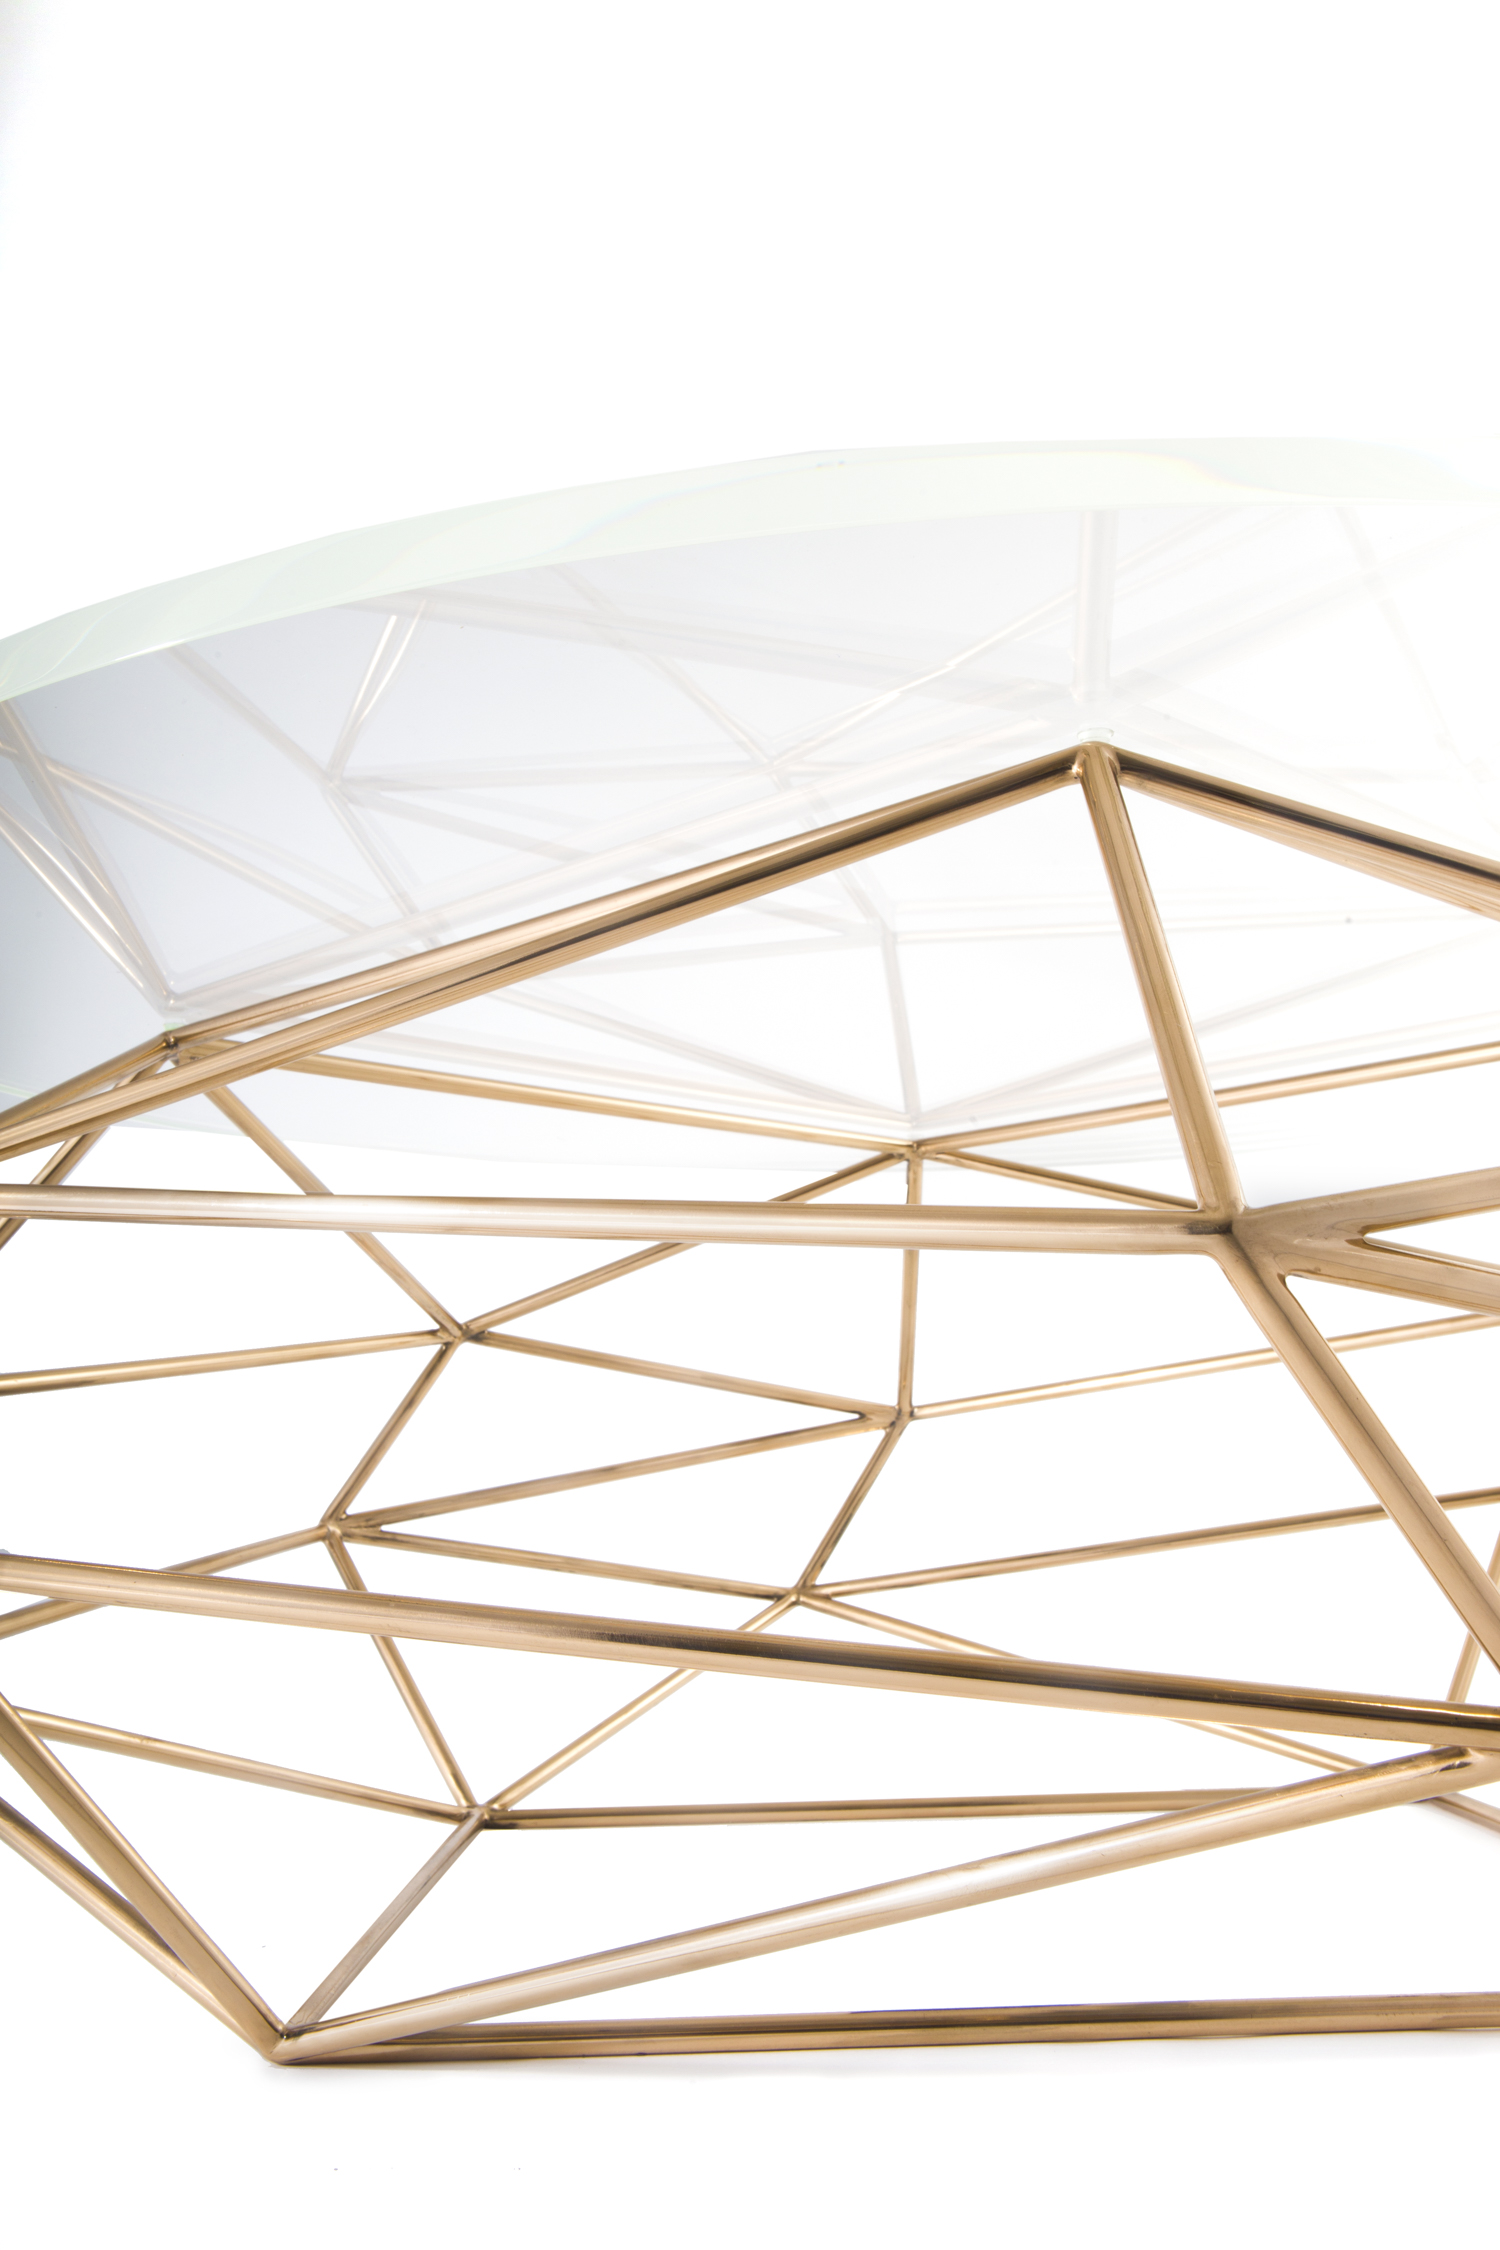 Archimedes_Bronze Glass Top_06.jpg